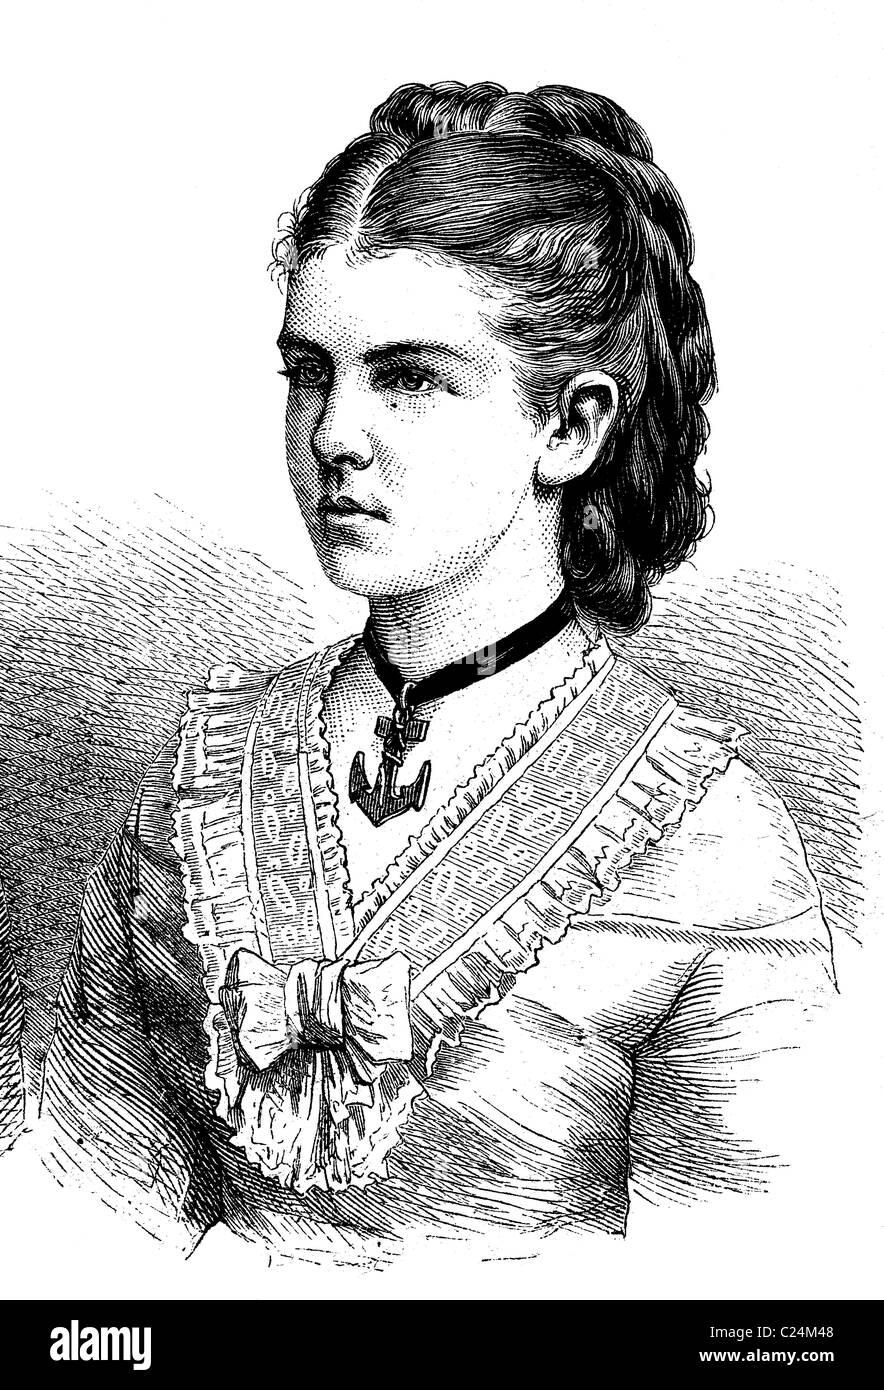 Princess Elizabeth Anna of Prussia, 1857 - 1895, wife of Grand Duke Friedrich August of Oldenburg, historical illustrati on, 187 Stock Photo